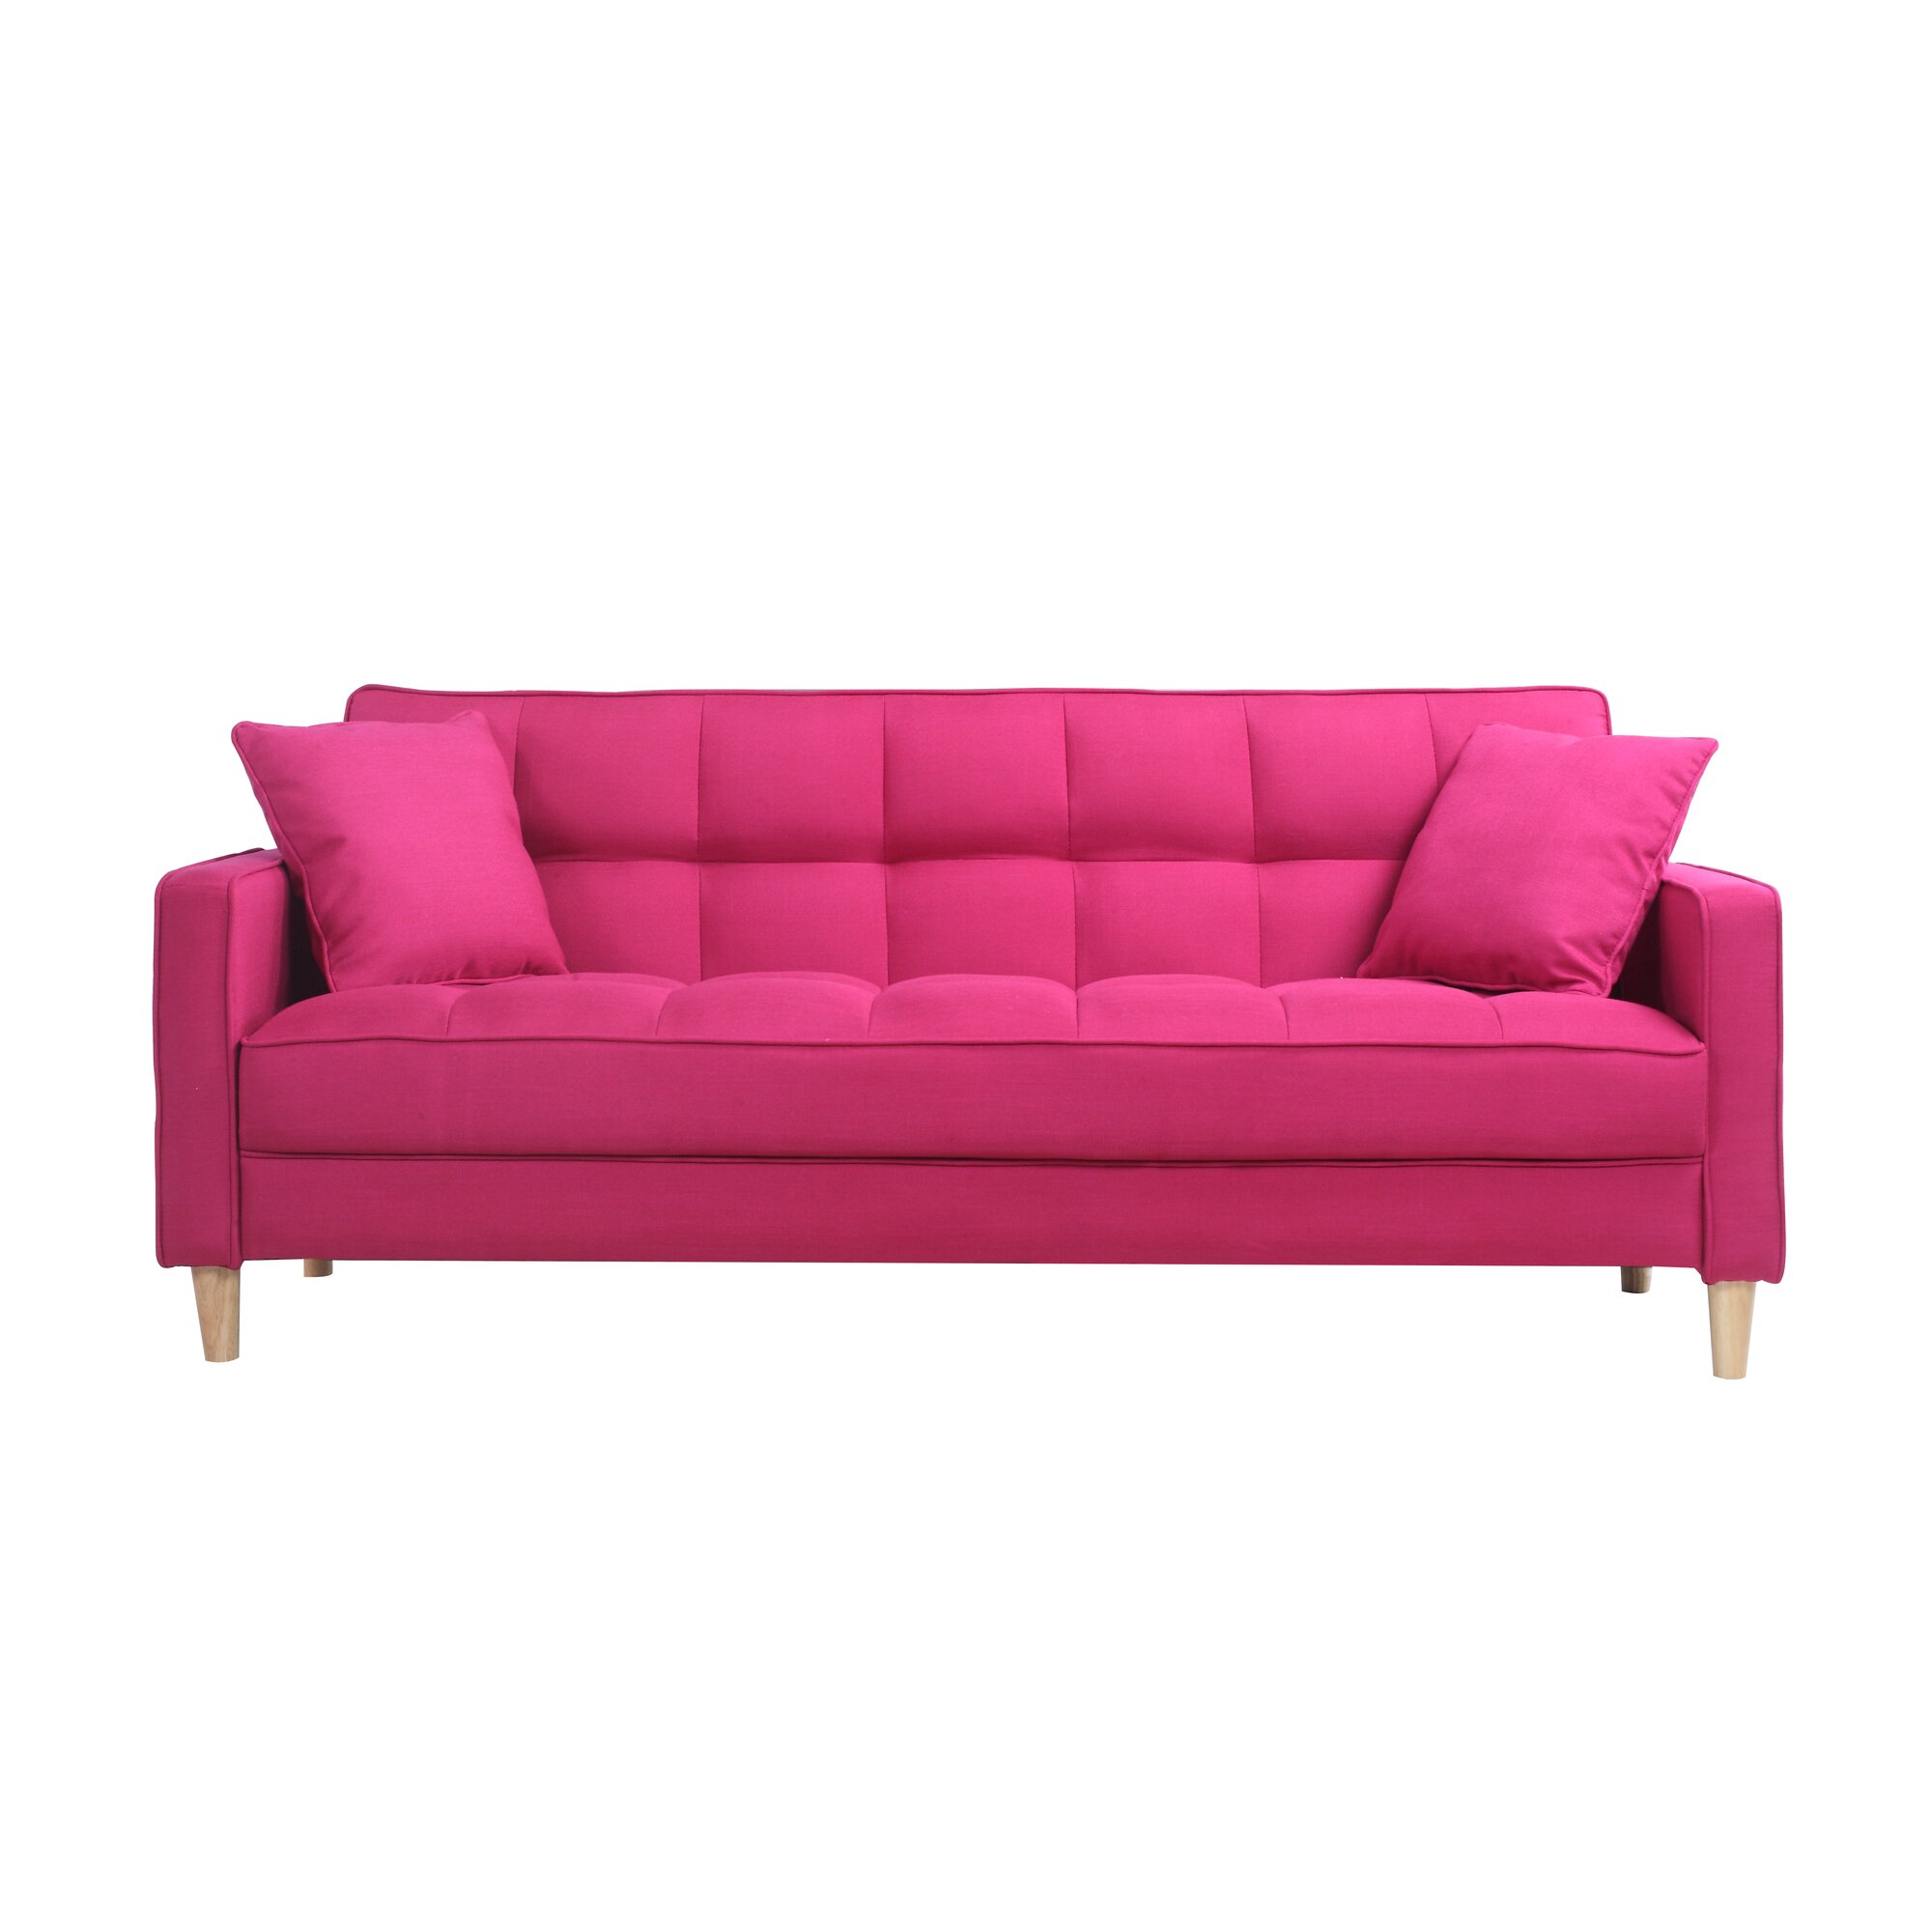 Ashley Milari Sleeper Sofa Living Room Antique From